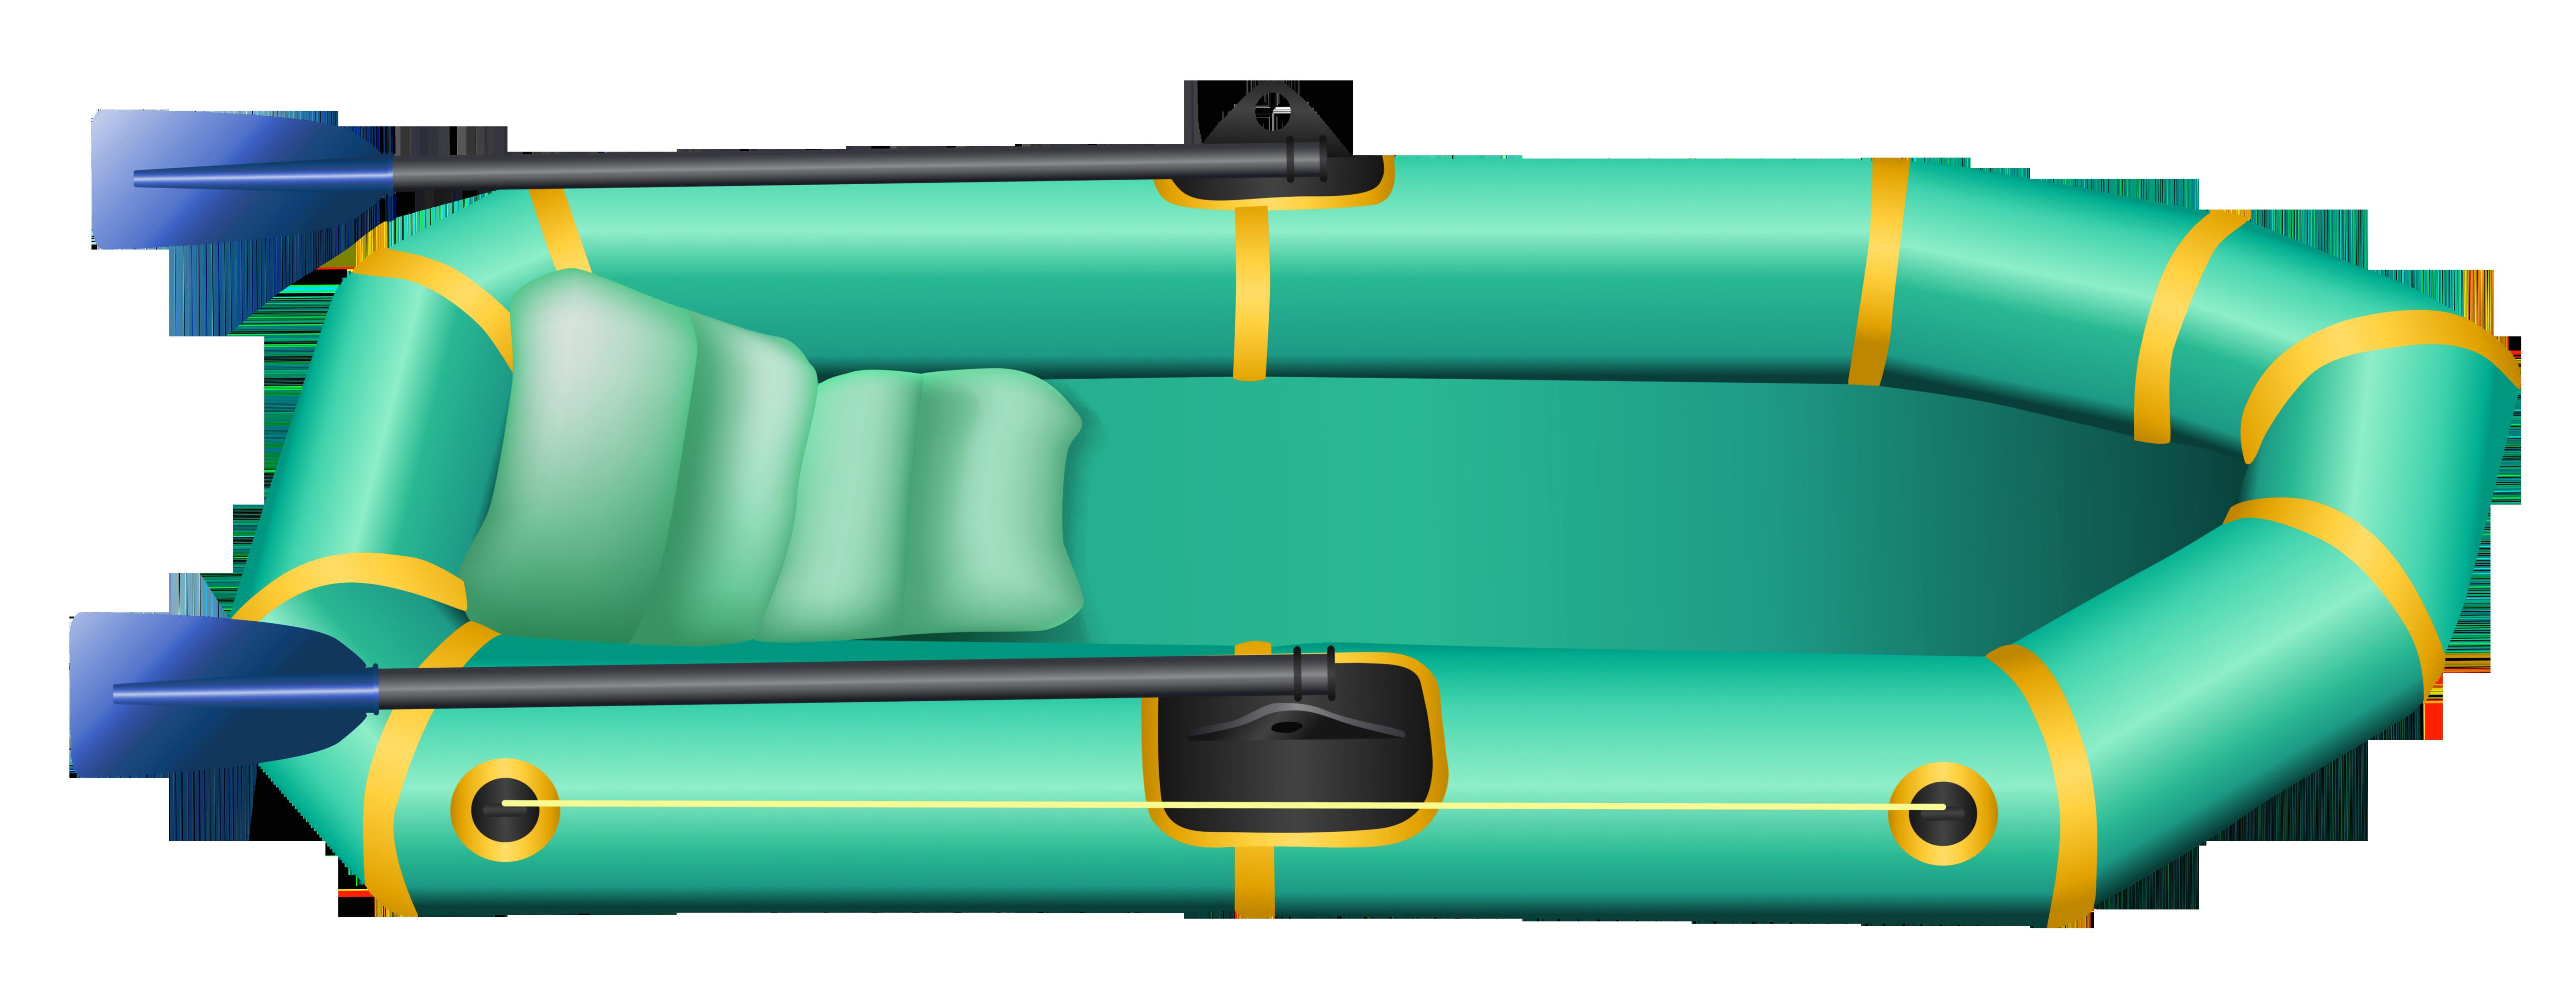 Sailboat clipart dinghy #15